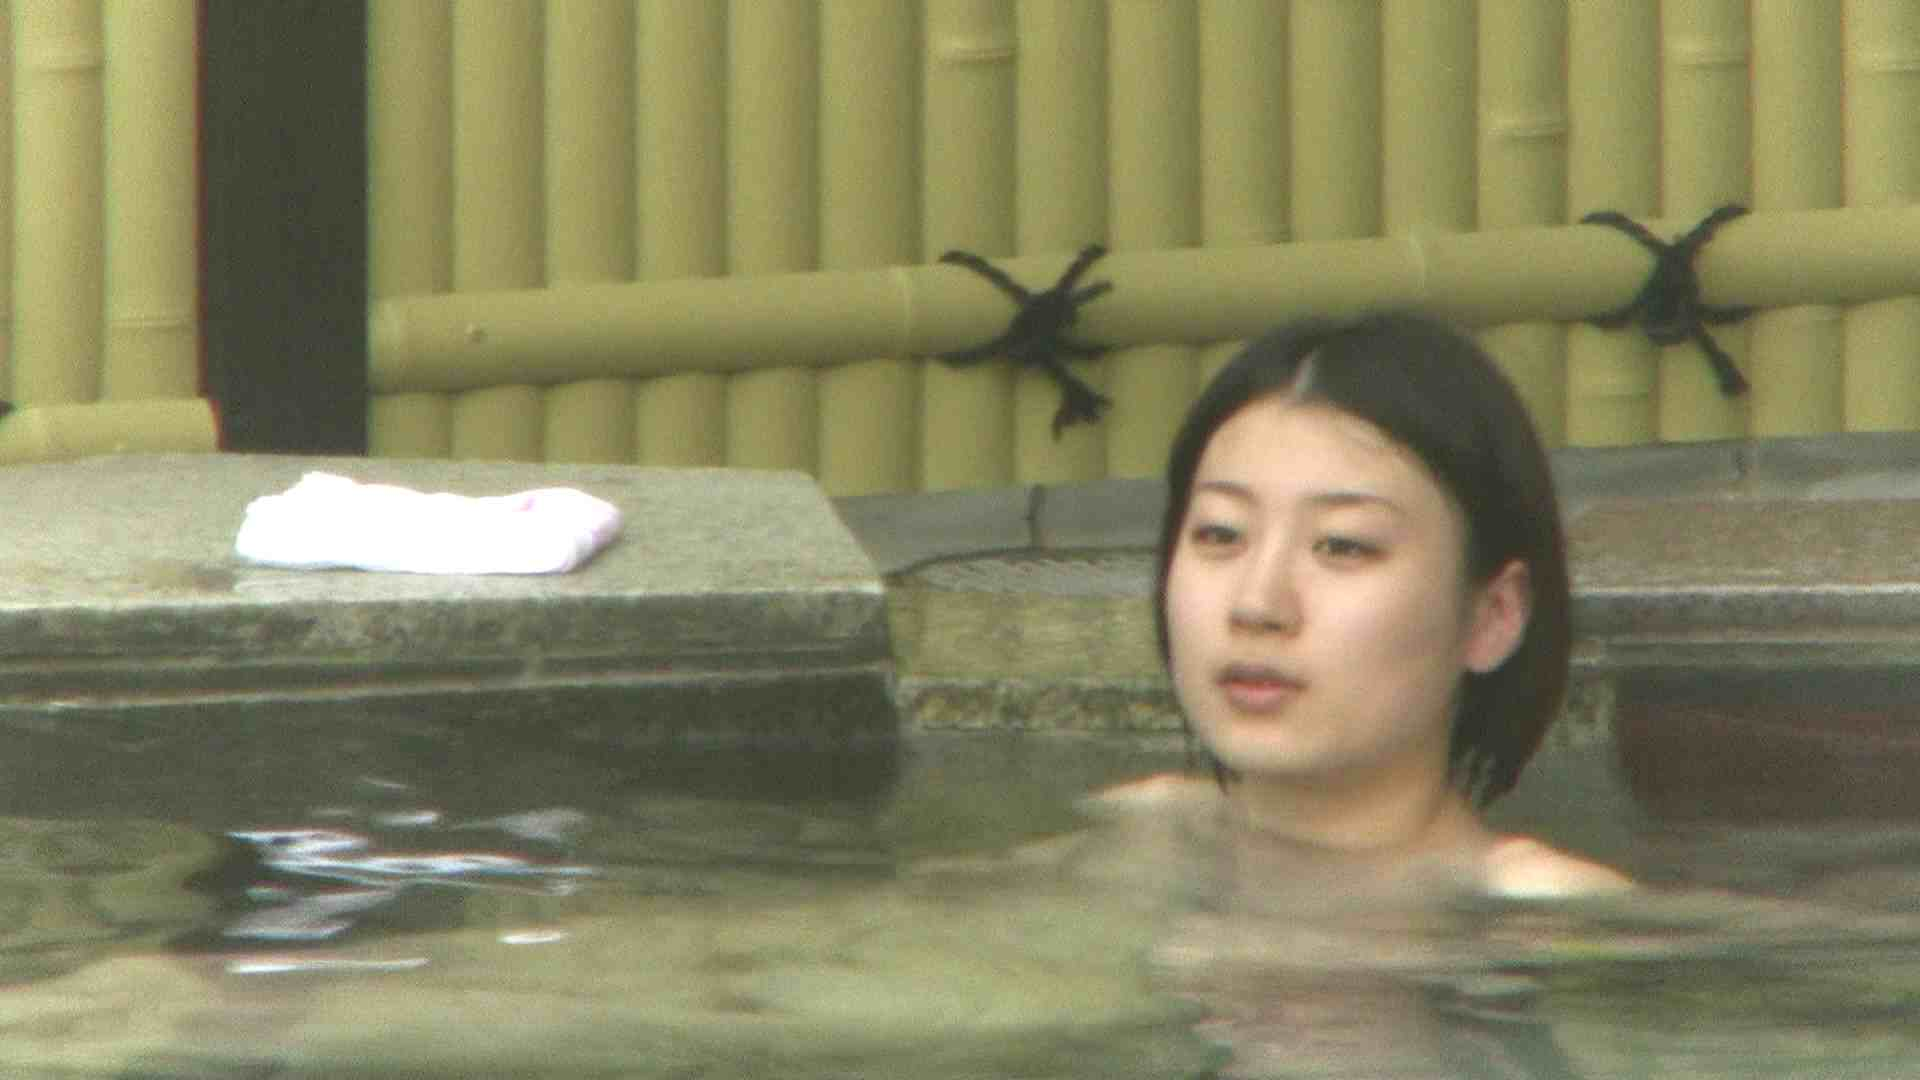 Aquaな露天風呂Vol.123 露天 | HなOL  75pic 5